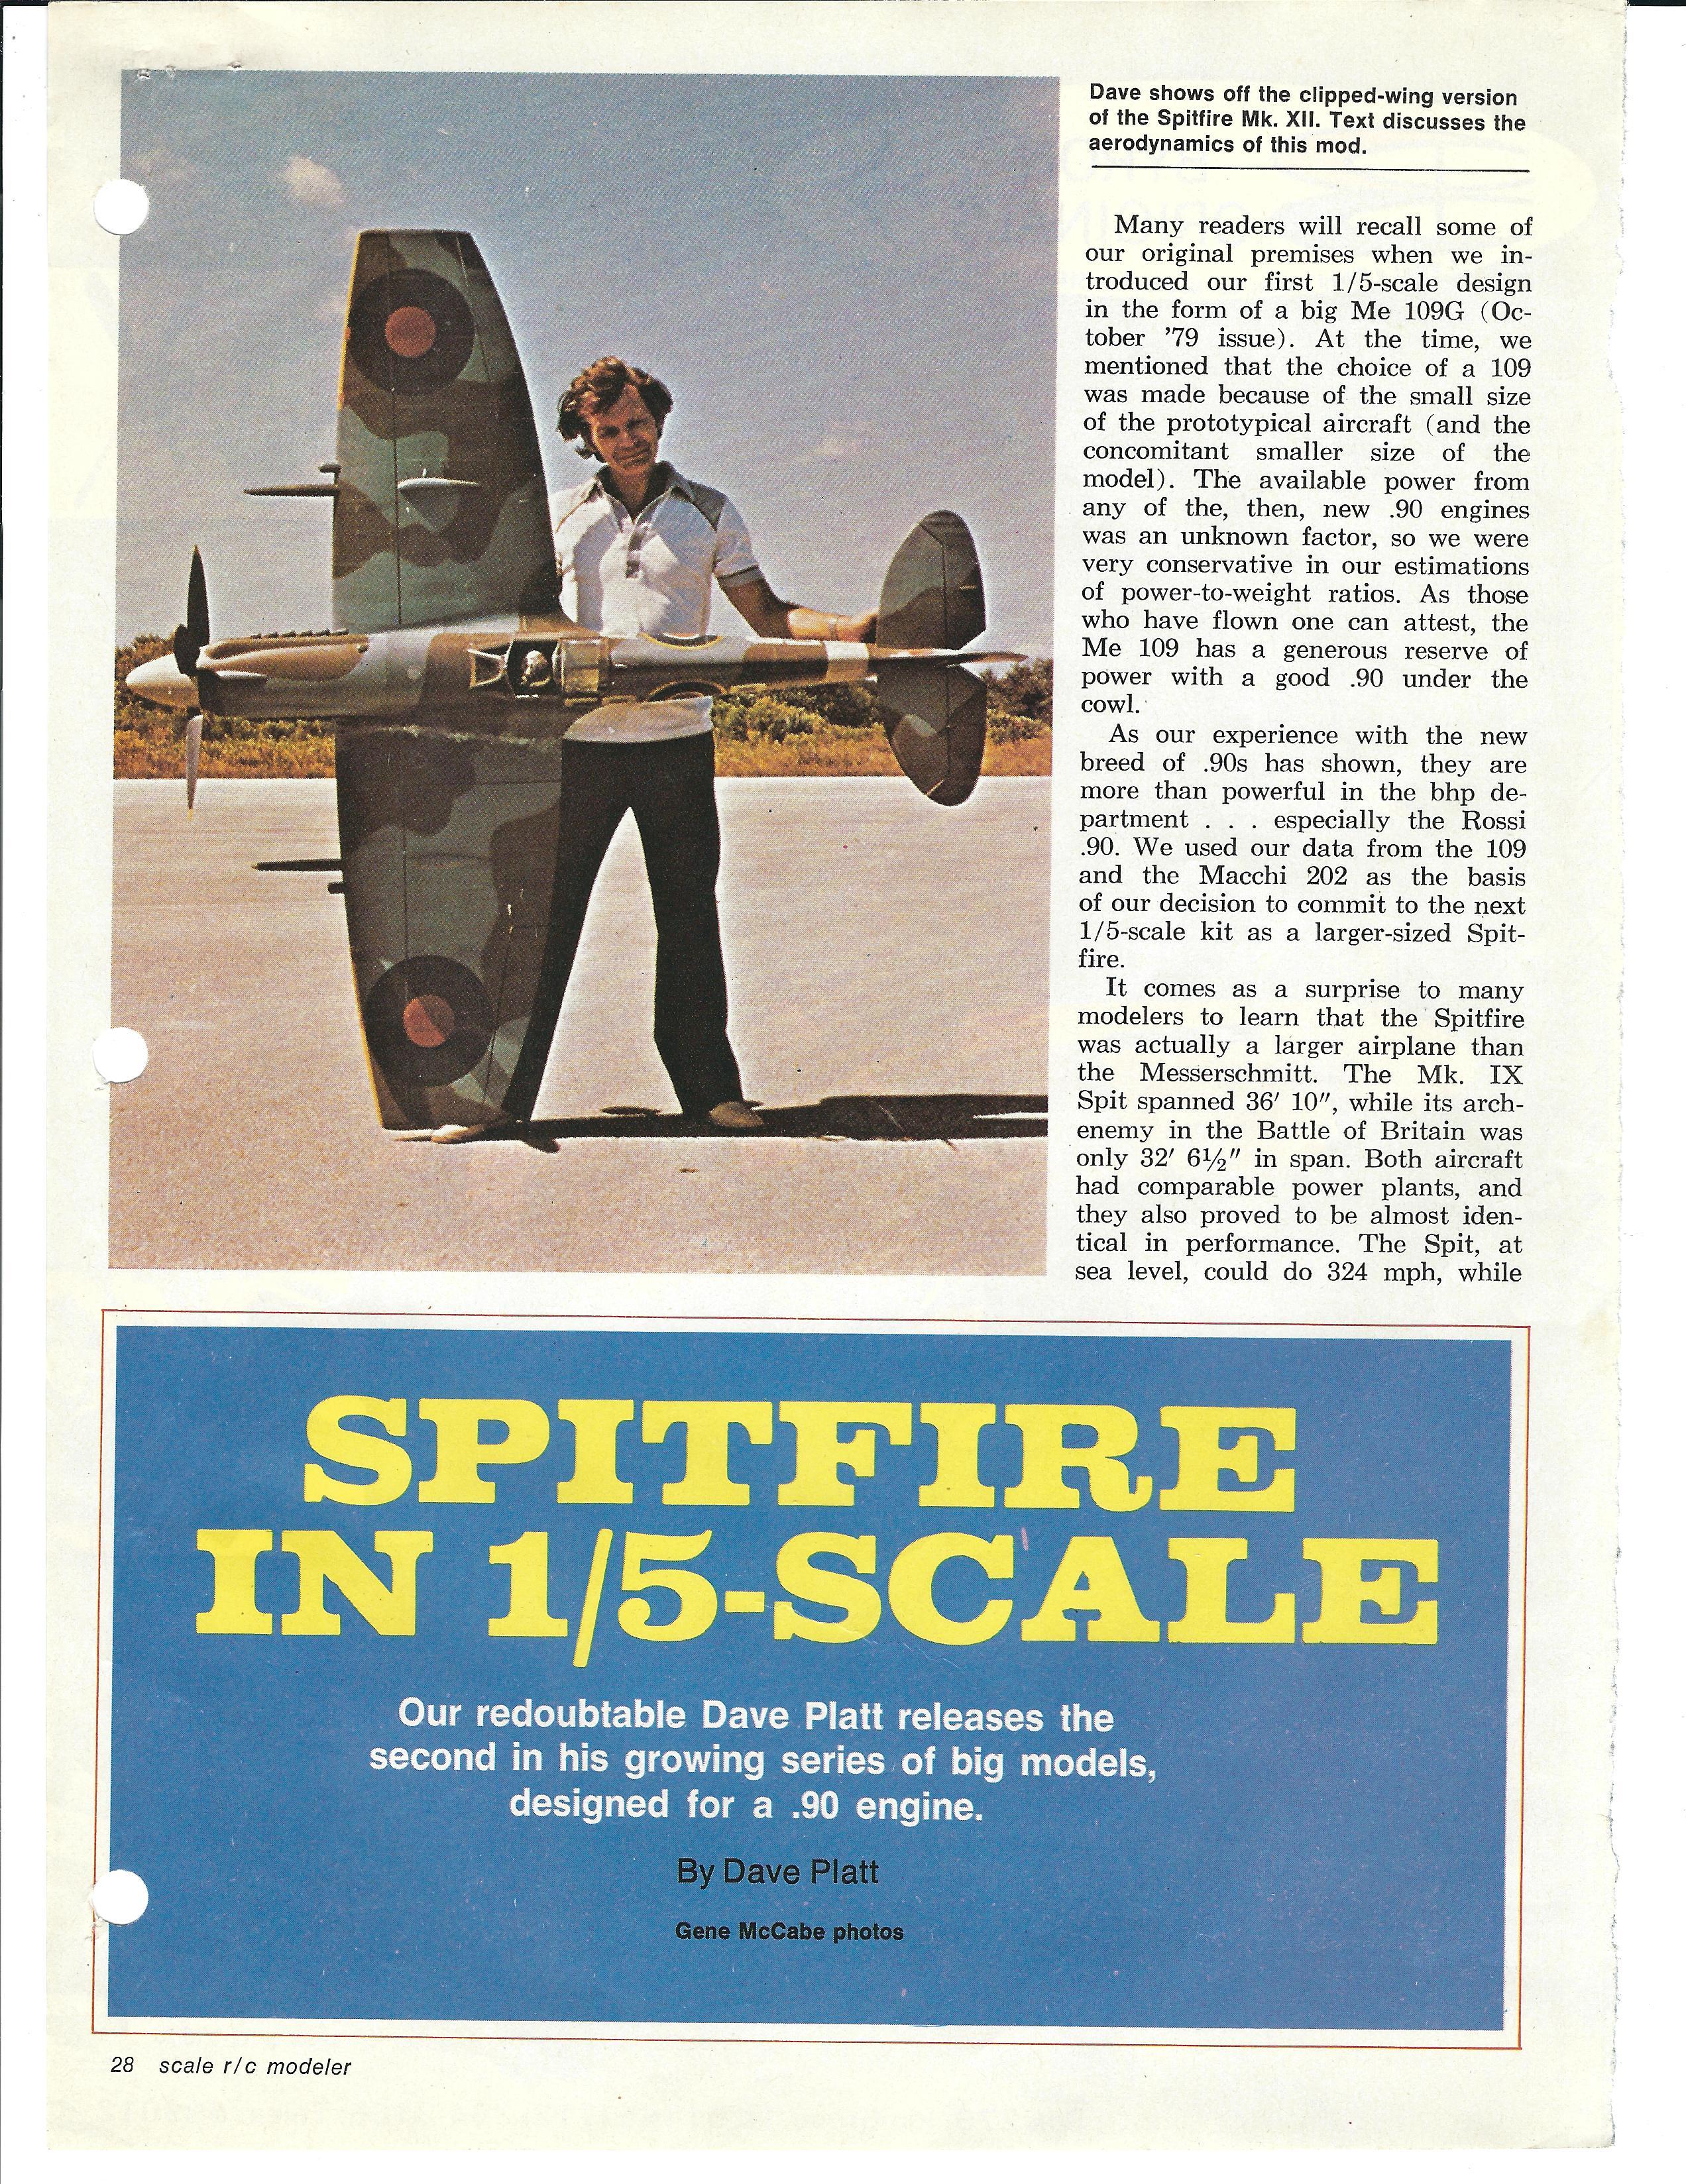 Click image for larger version  Name:Dave Platt Spitfire SRC 1.jpg Views:9 Size:1.77 MB ID:2245050